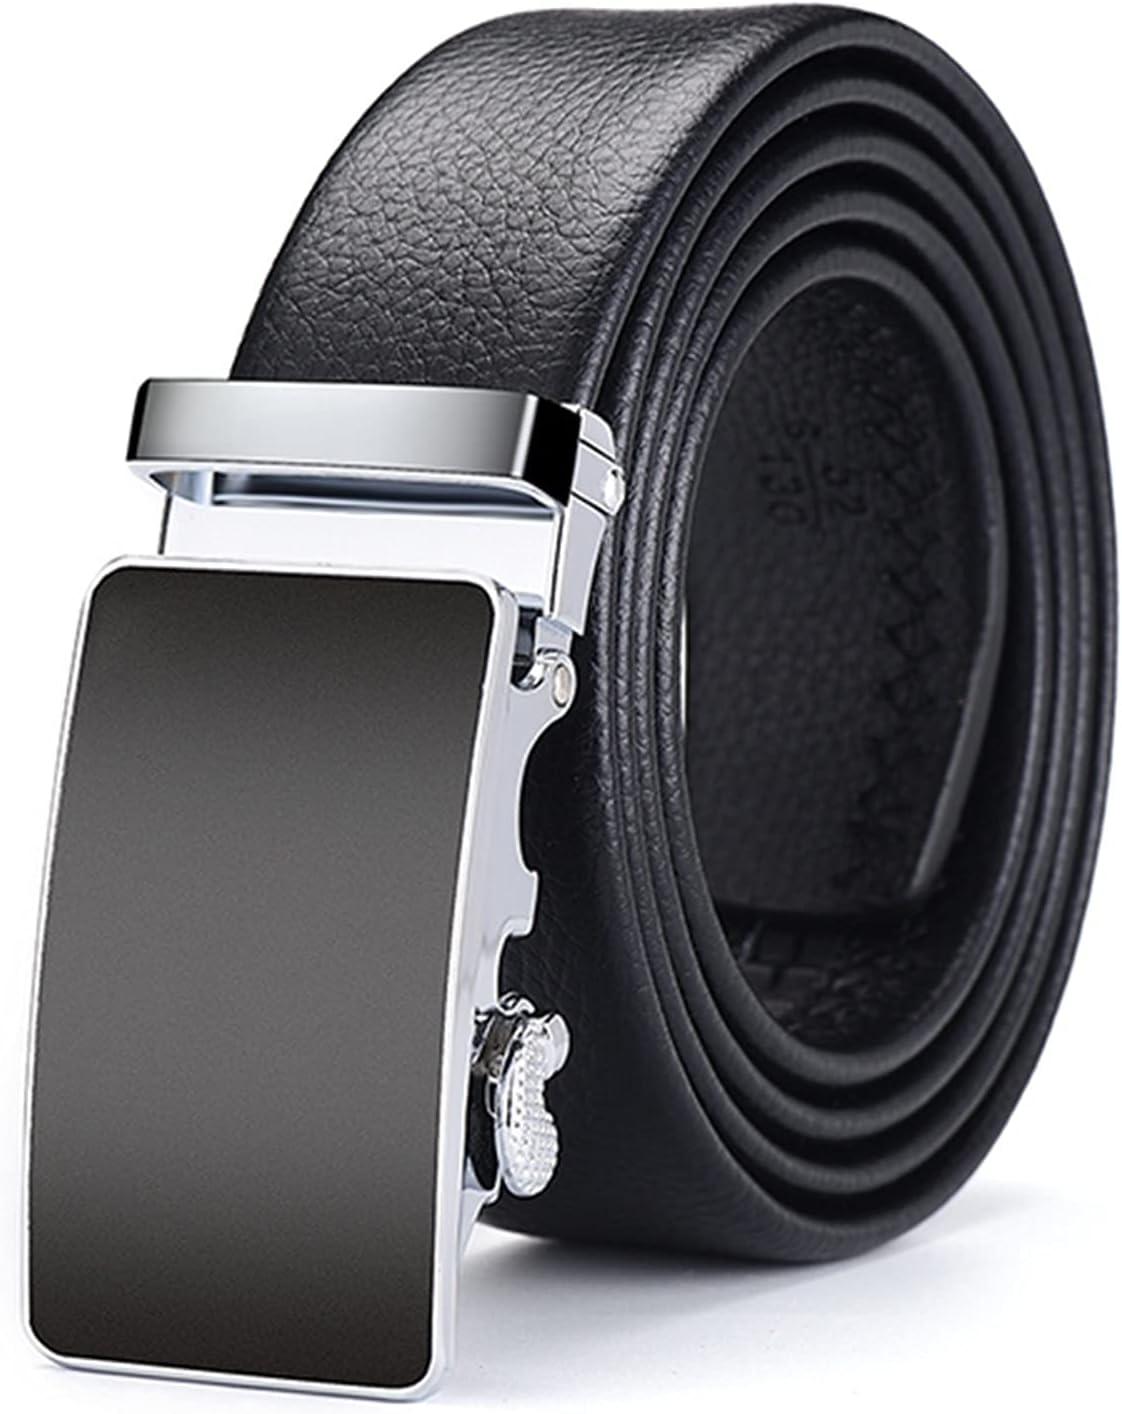 Superior YUMYANJIN Belt Now free shipping Men Genuine Luxury Male for Belts Strap